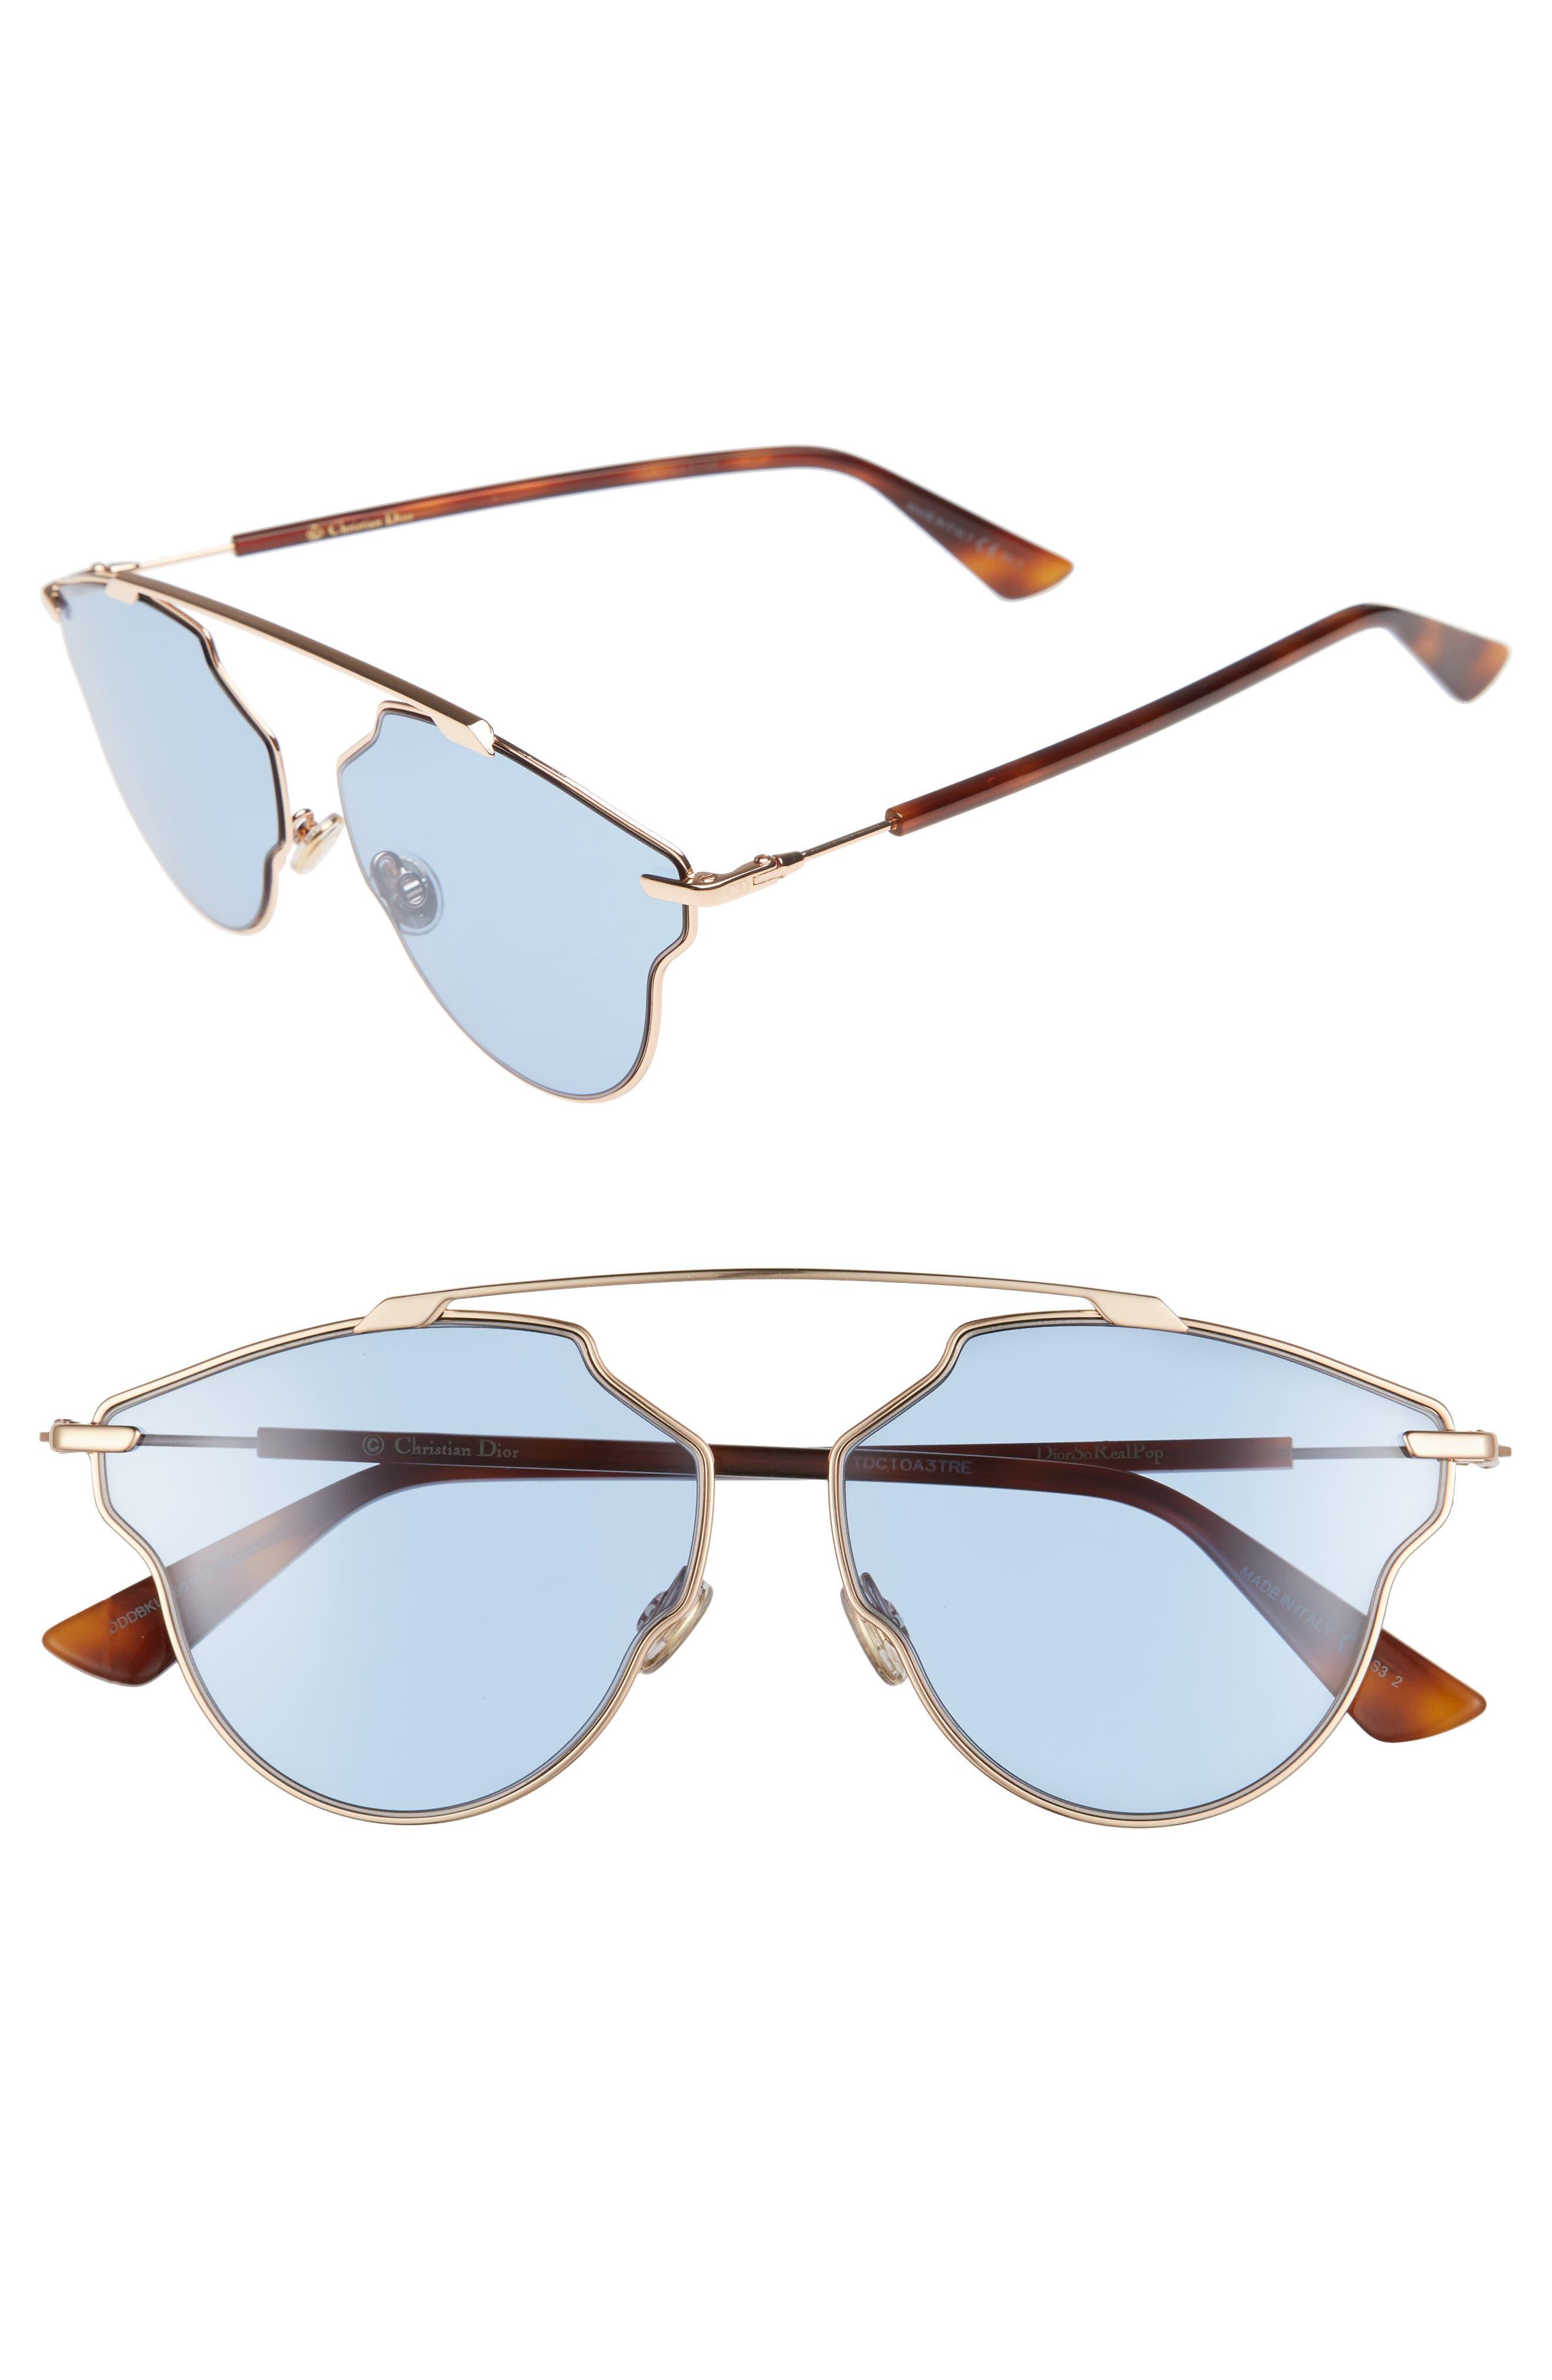 Main Image - Dior 448 Dior 59mm Sunglasses